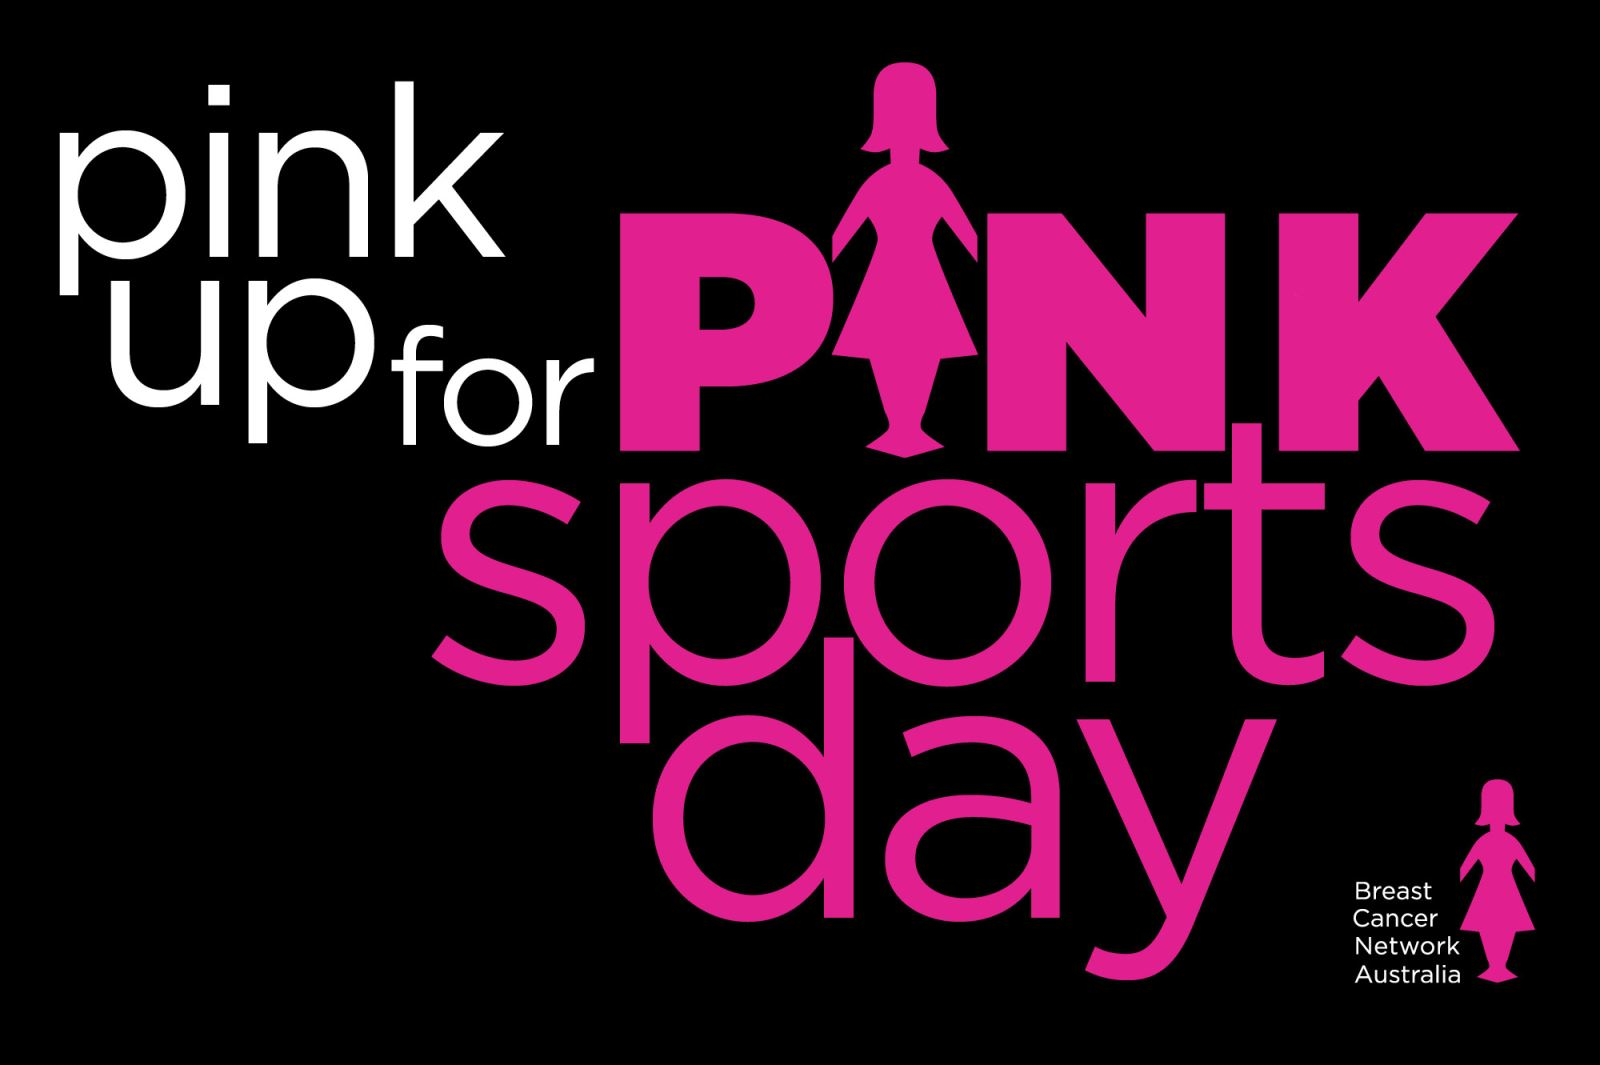 pinksportsday.jpg